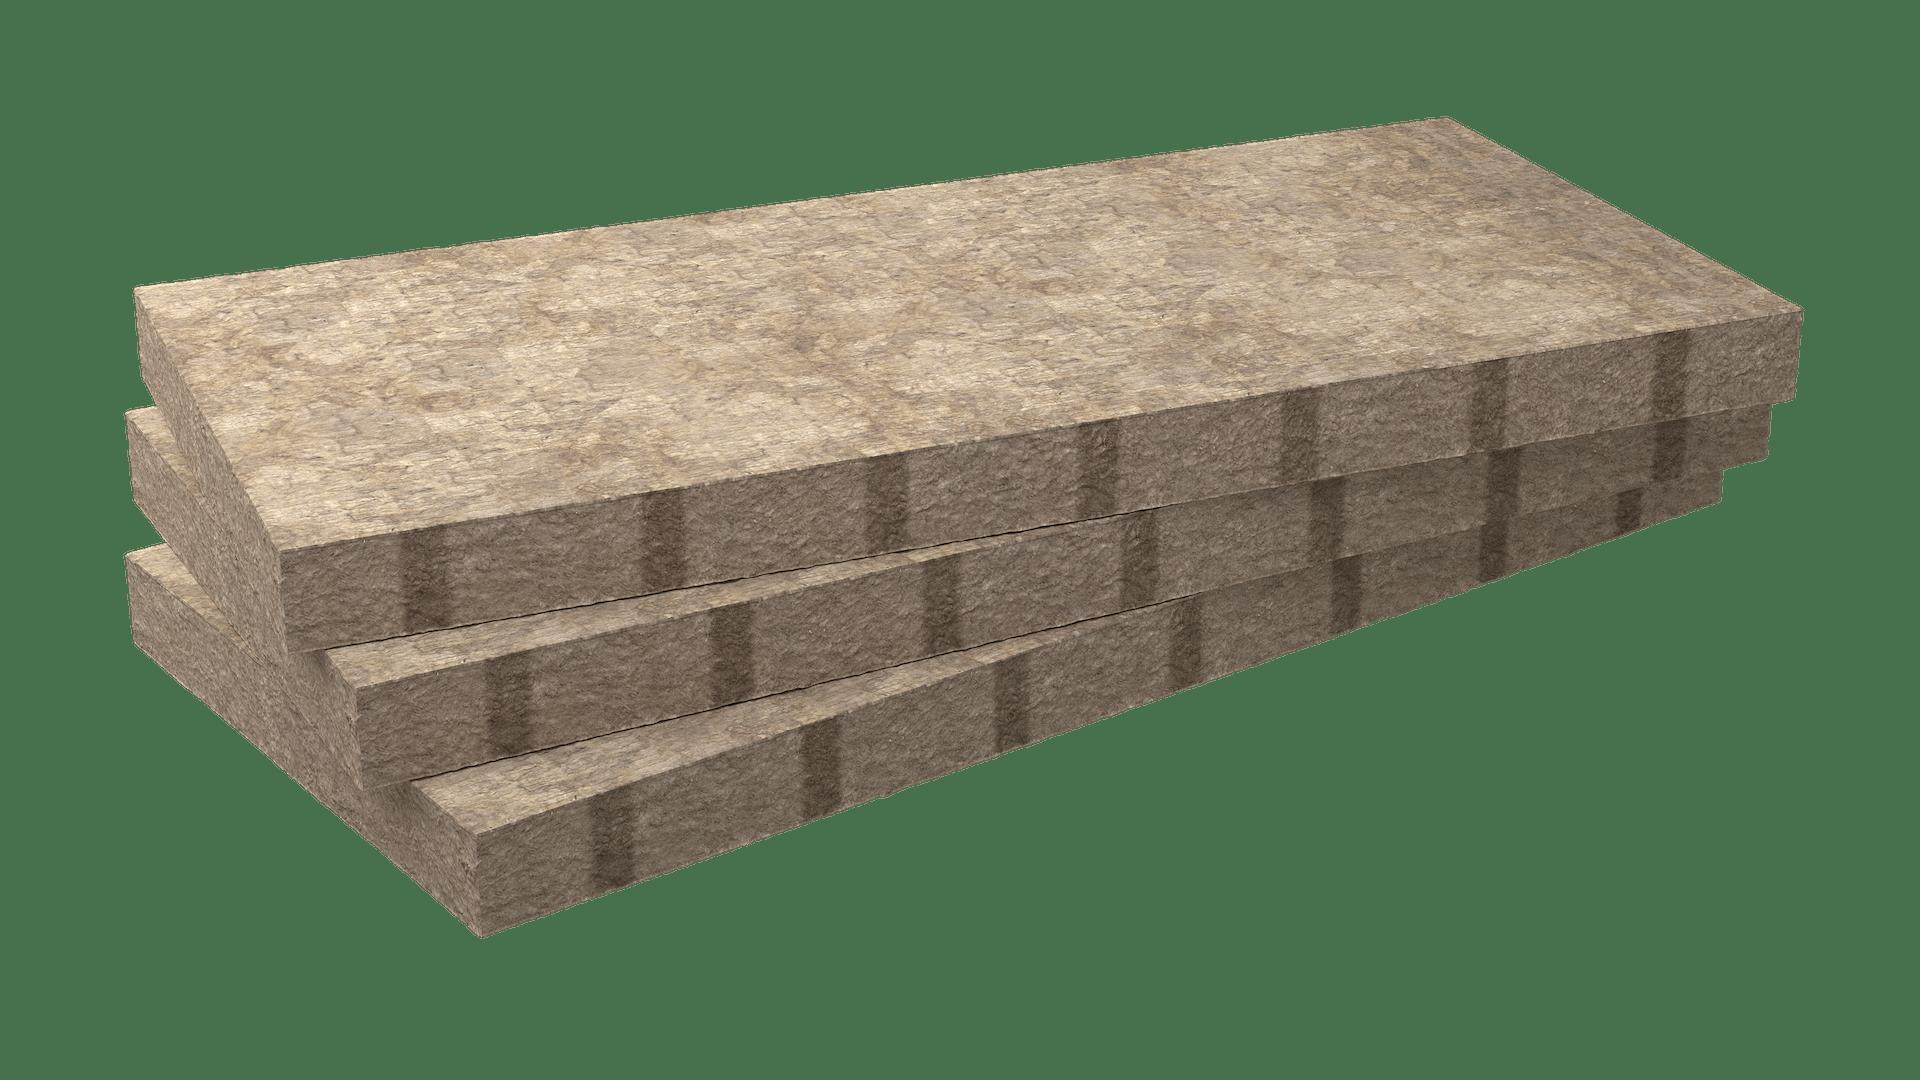 Rockcomble 2020, combles aménagés, pitched roof